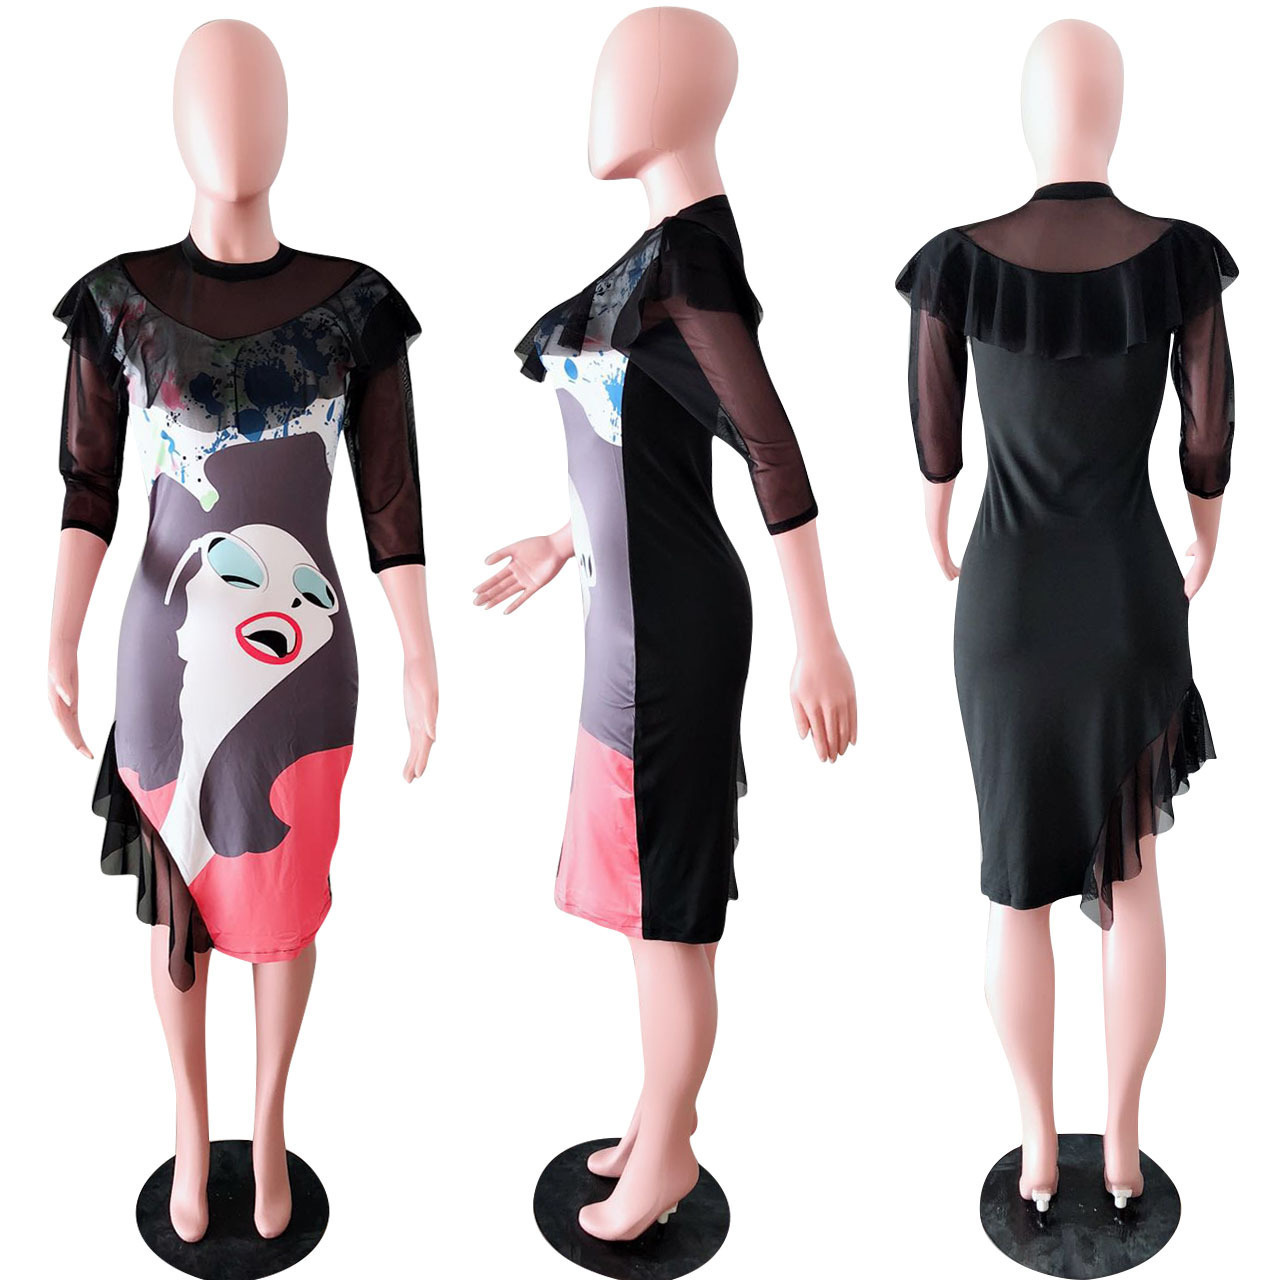 Y8028 2018 Slim Sexy Nightclub Interest Printing Net Yarn Dress